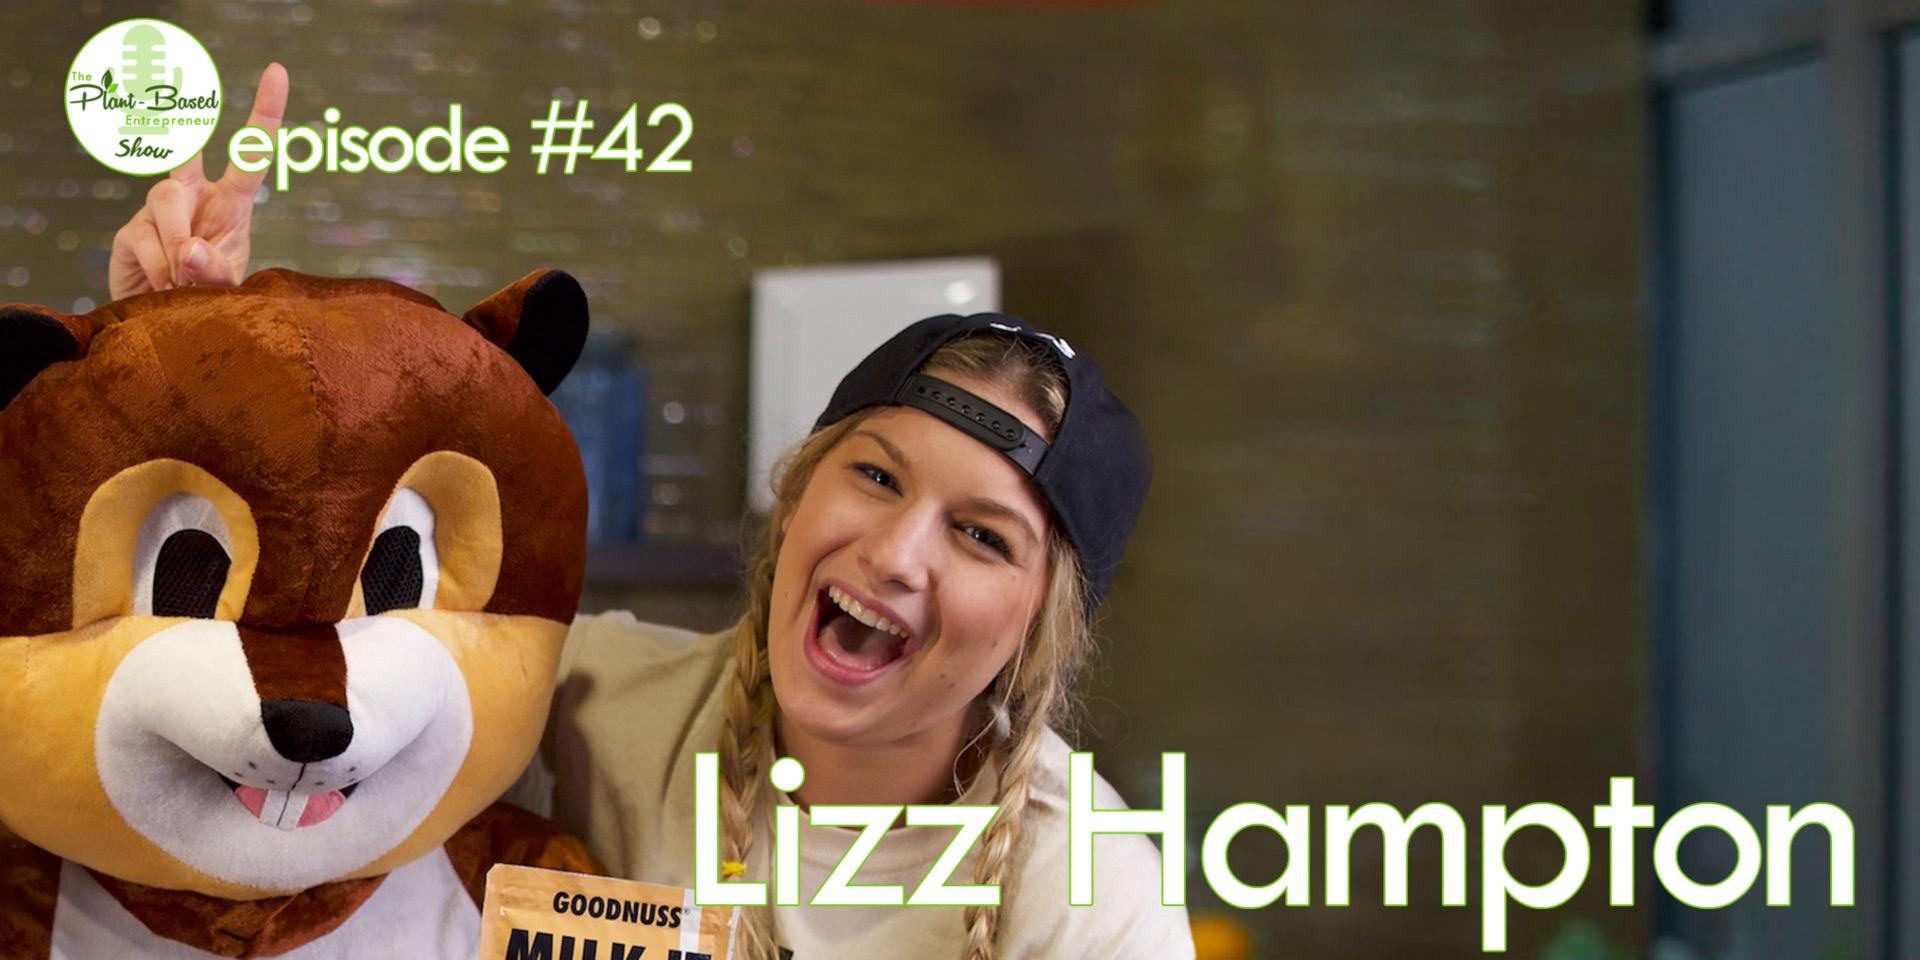 Episode #42 - Lizz Hampton